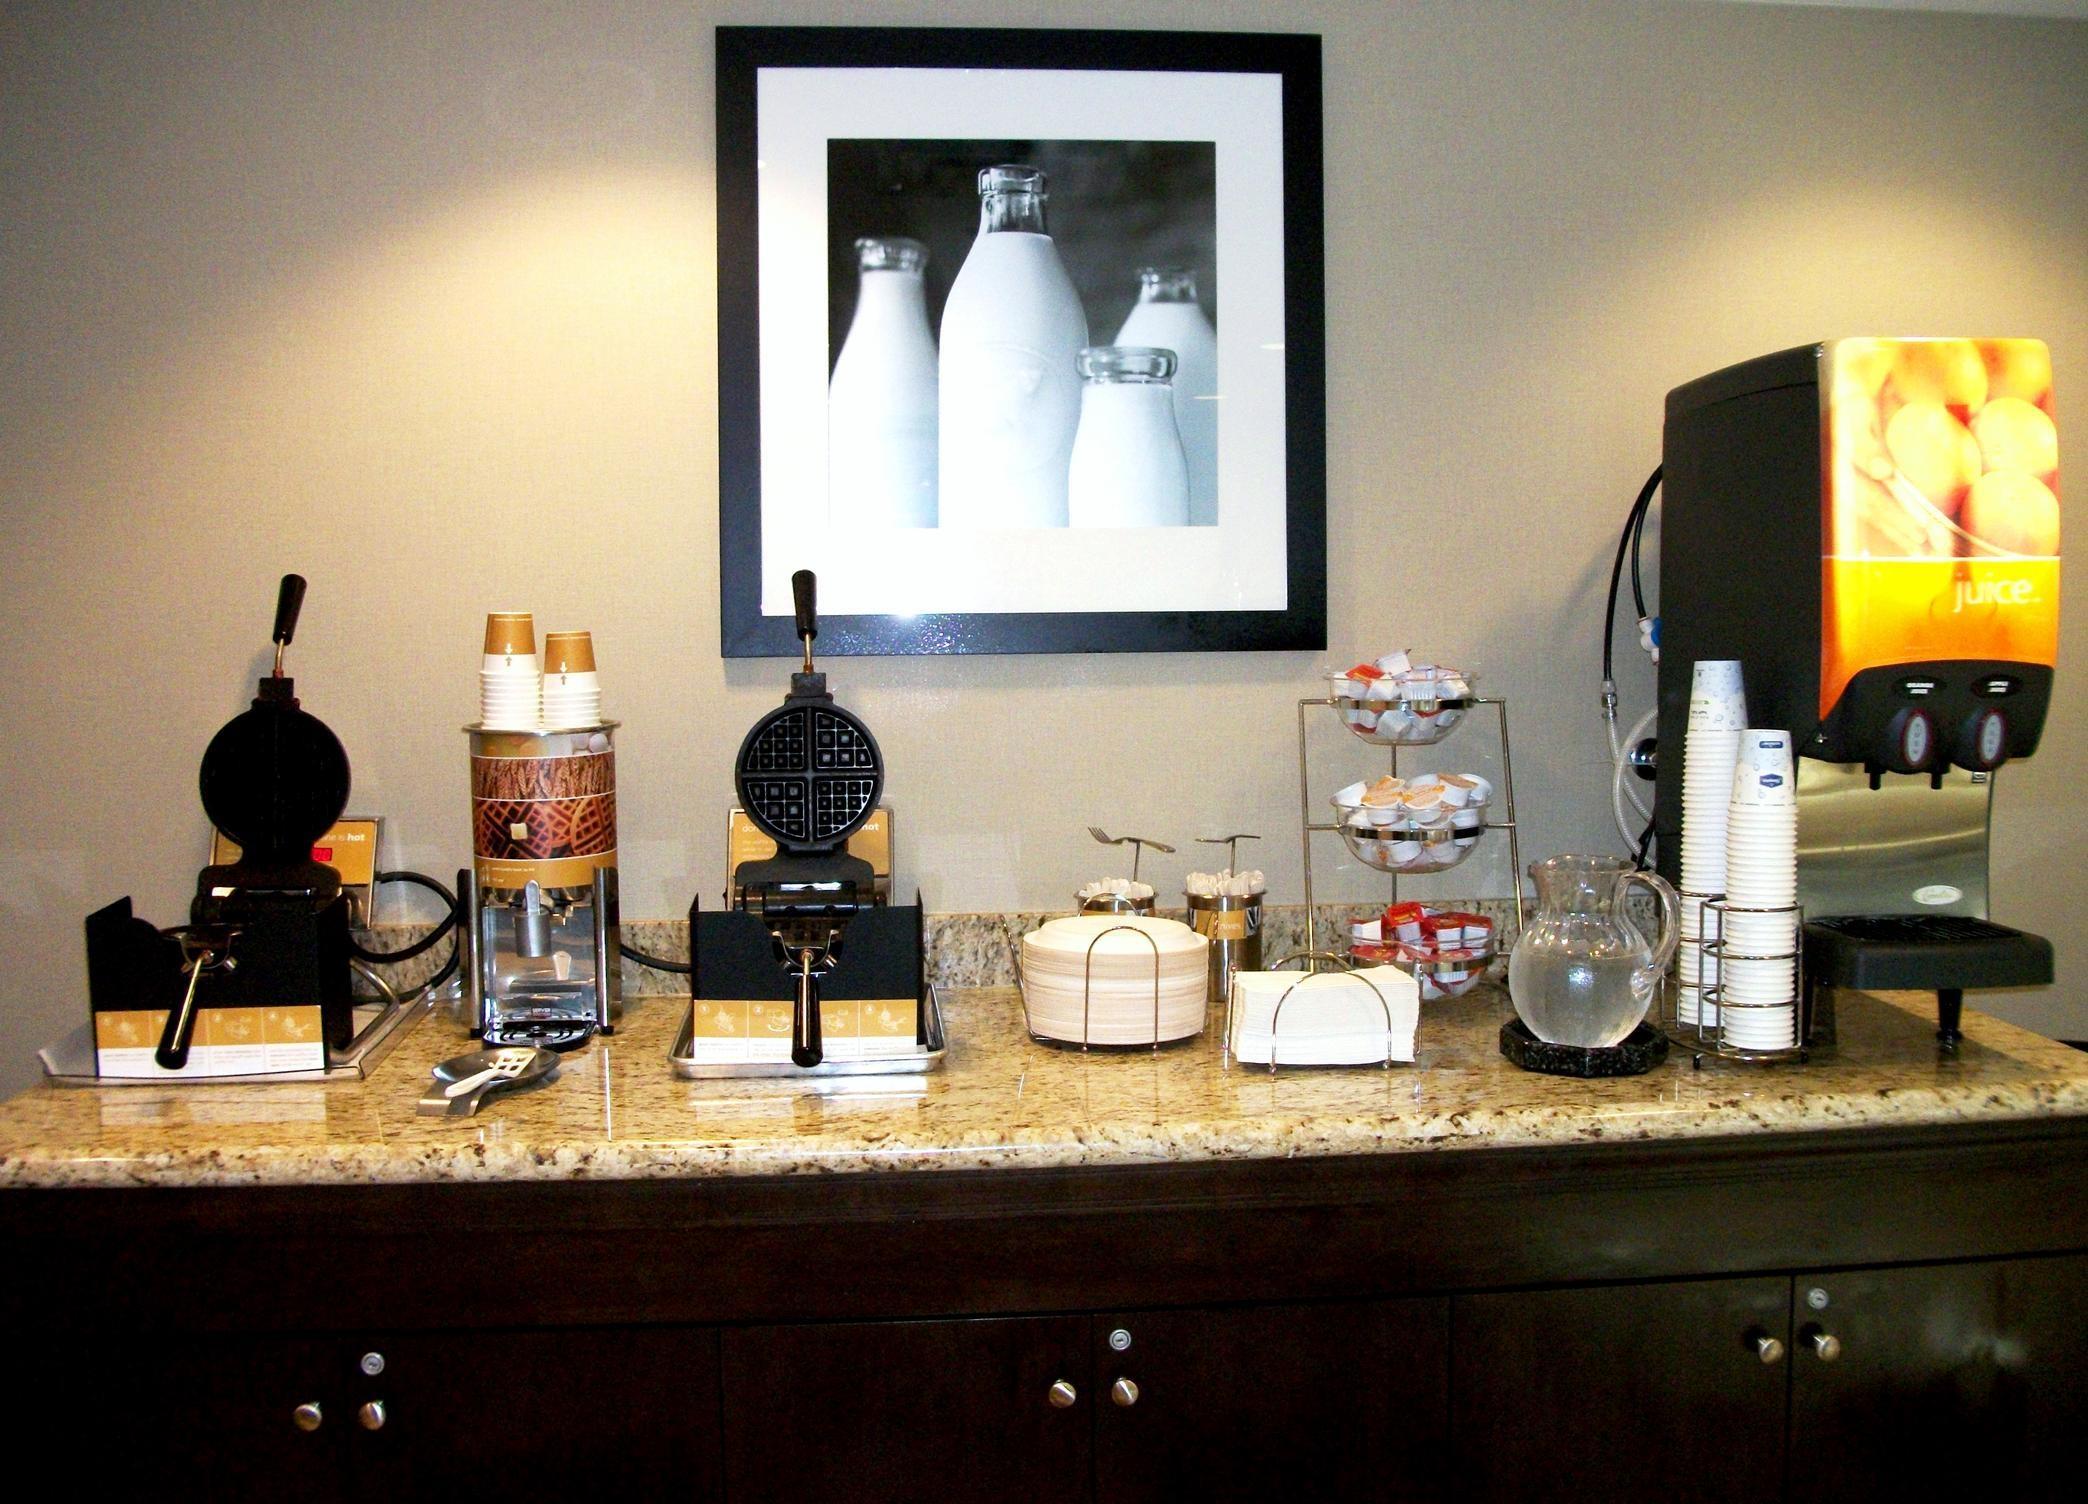 Hampton Inn & Suites Manteca image 31